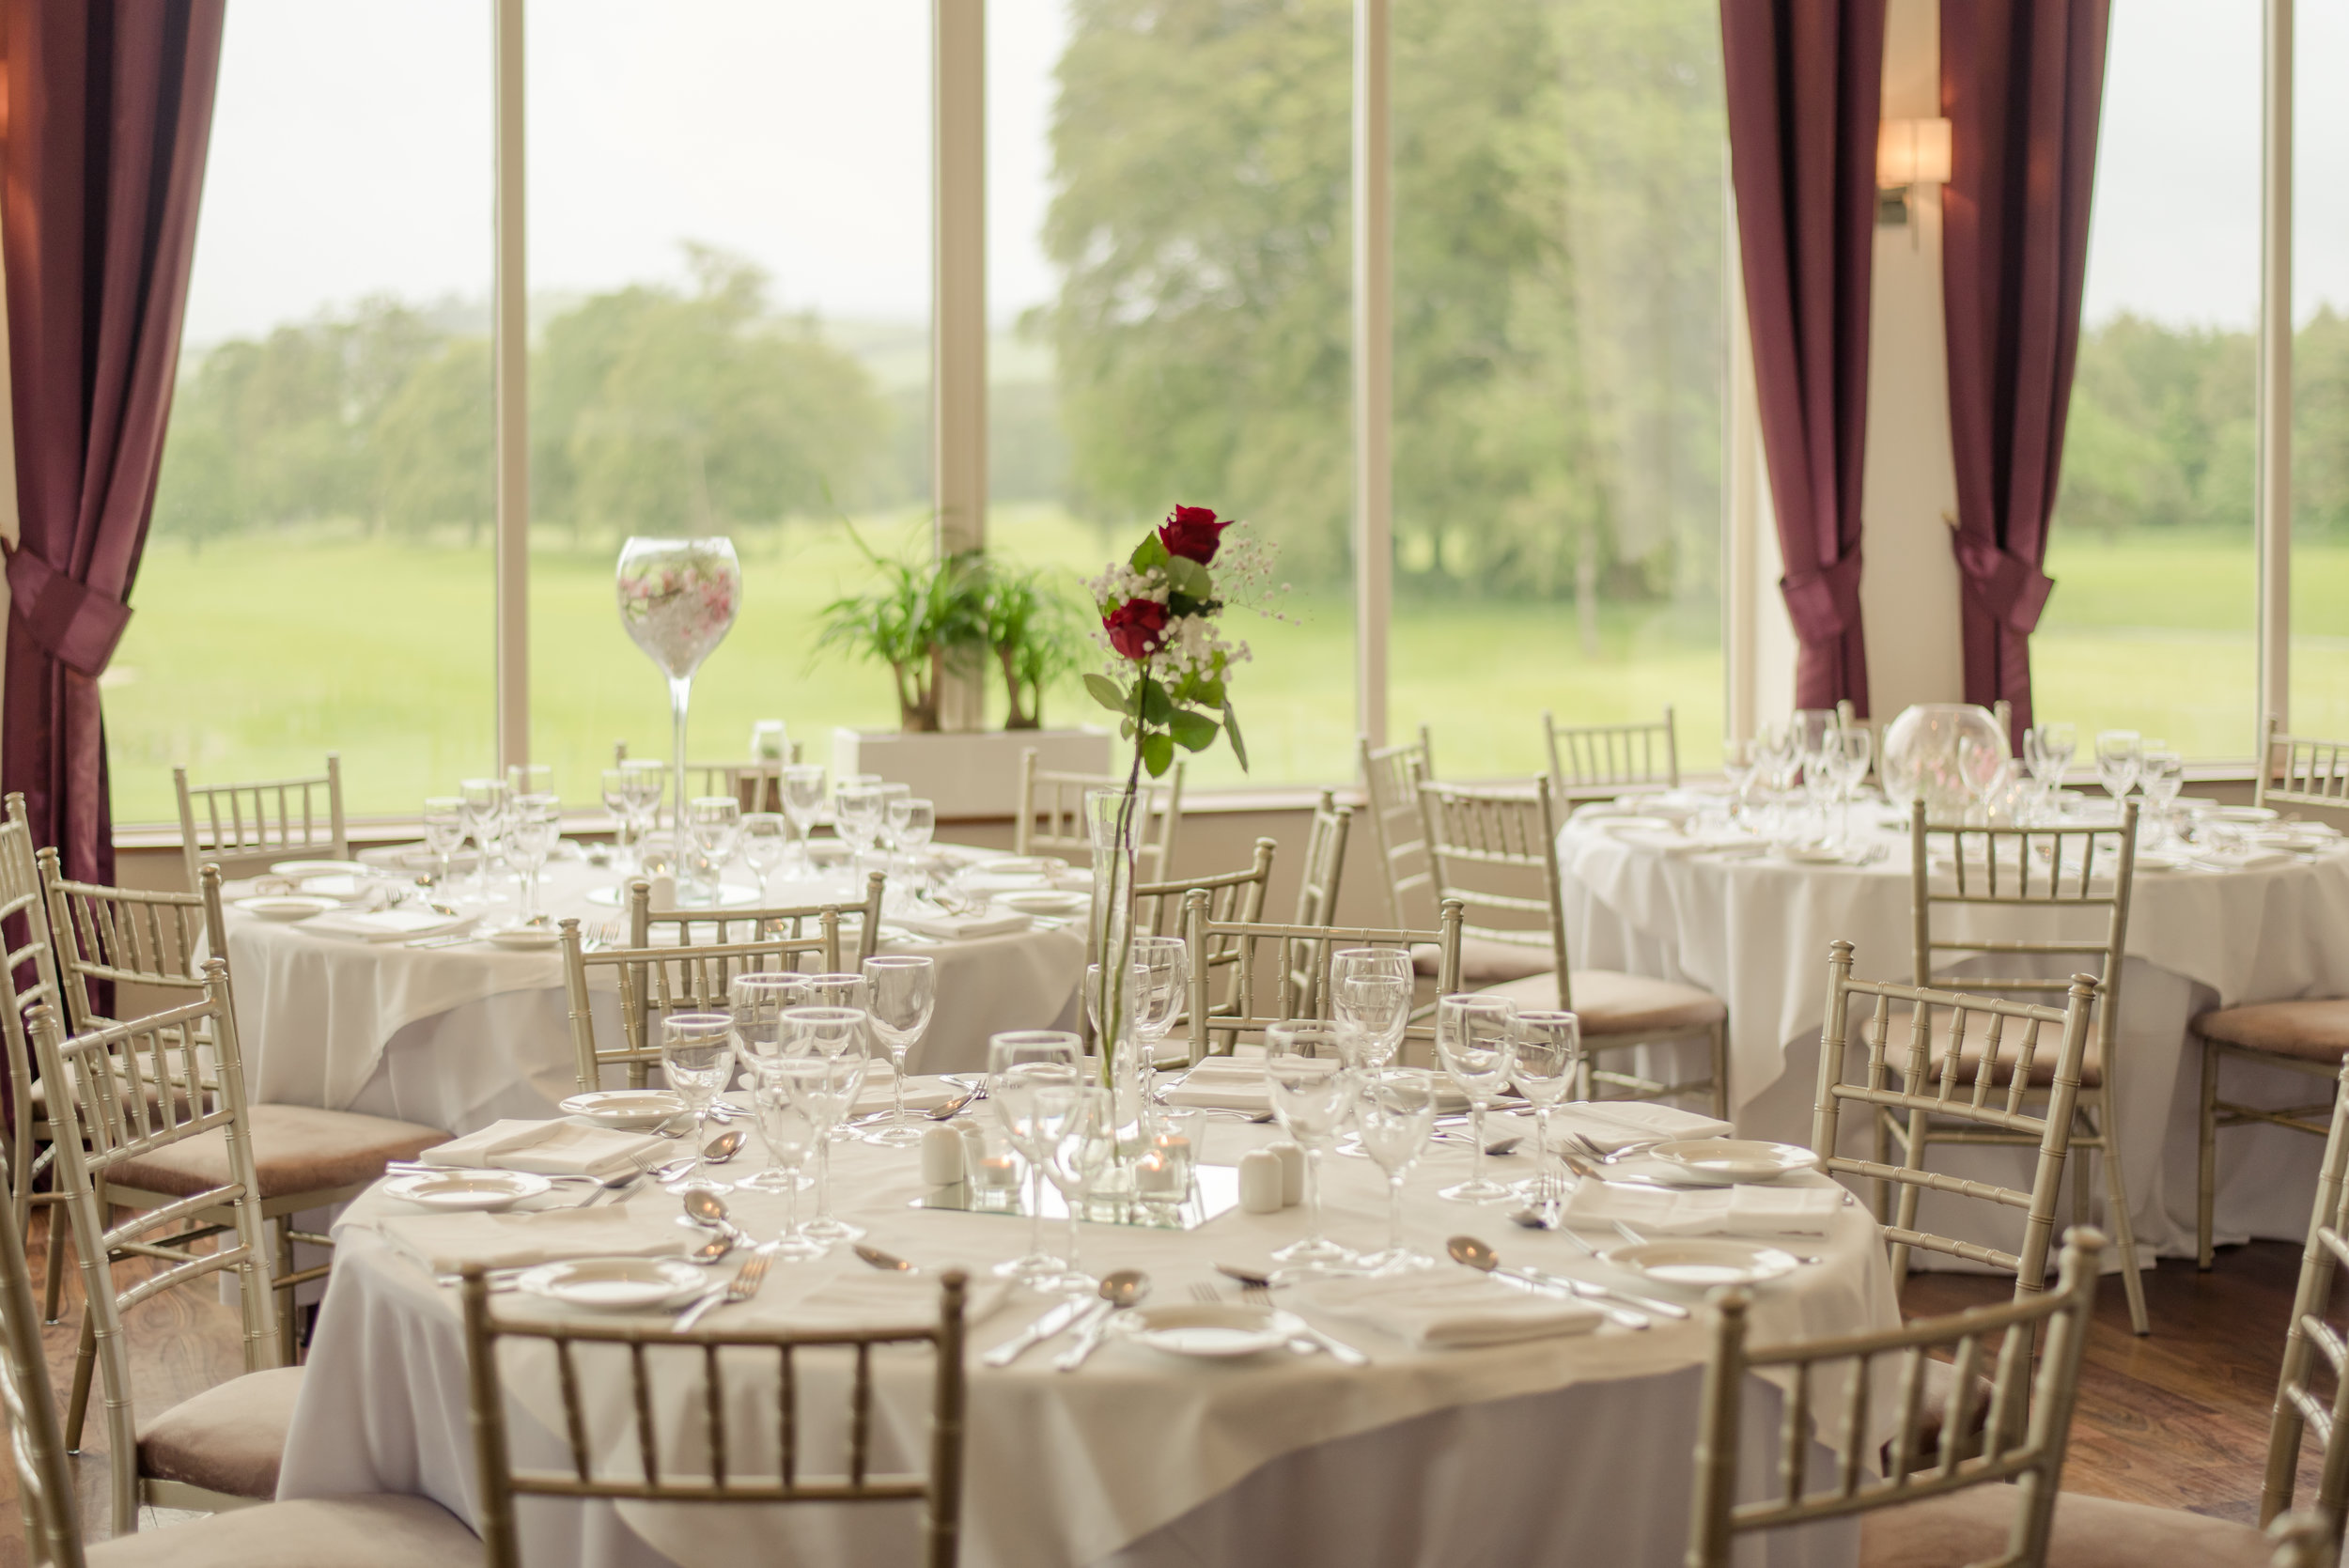 Tulfarris Hotel & Golf Resort intimate wedding with golf course view.jpg